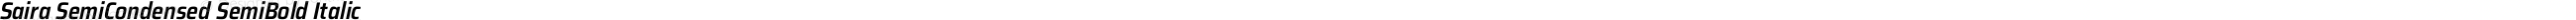 Saira SemiCondensed SemiBold Italic